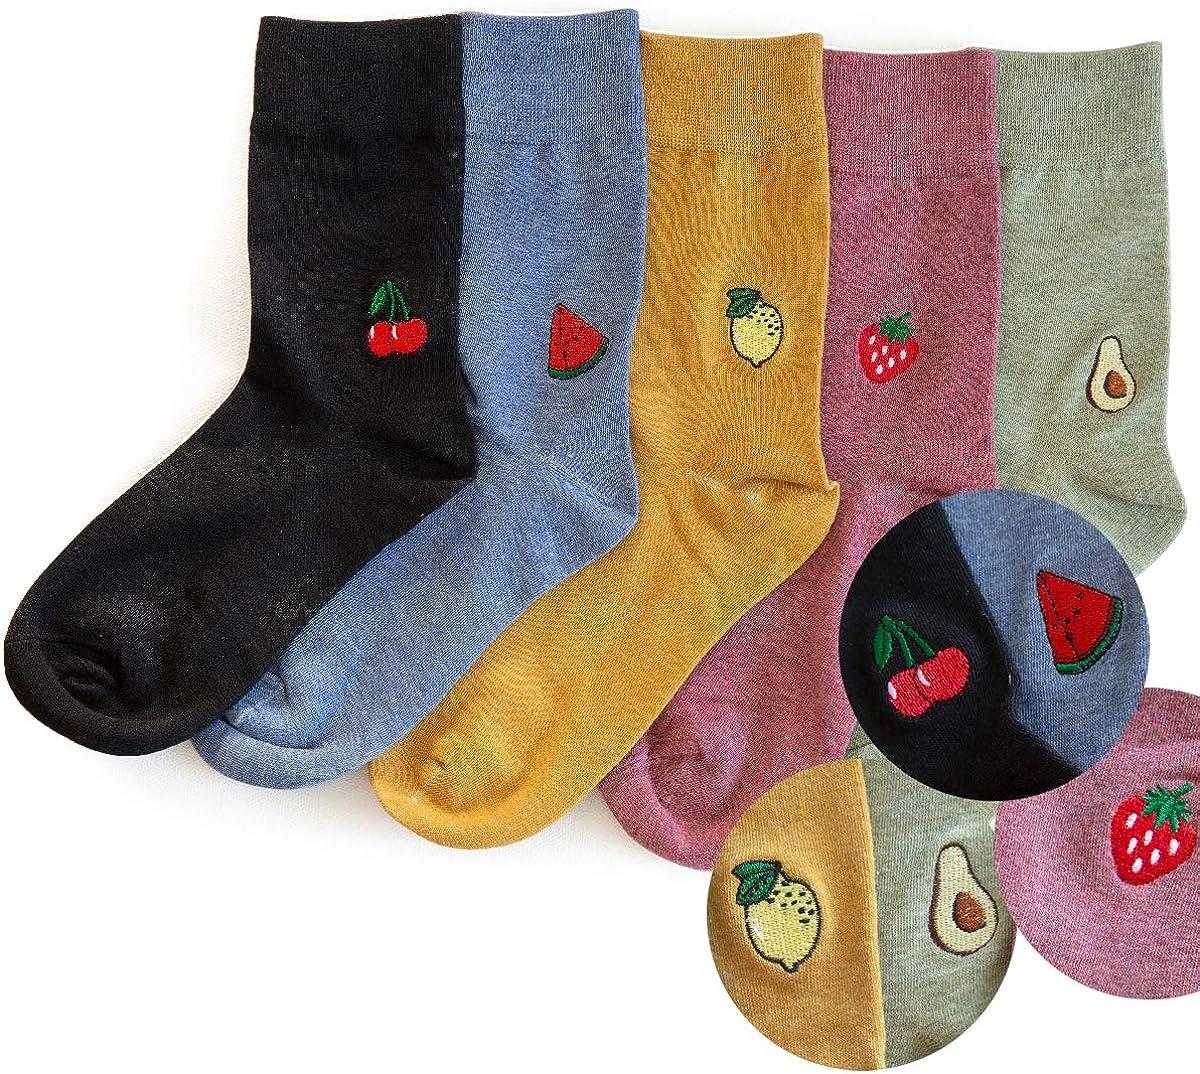 lapisbee Max 48% OFF Women's shopping Casual Socks Funny novelty Cute